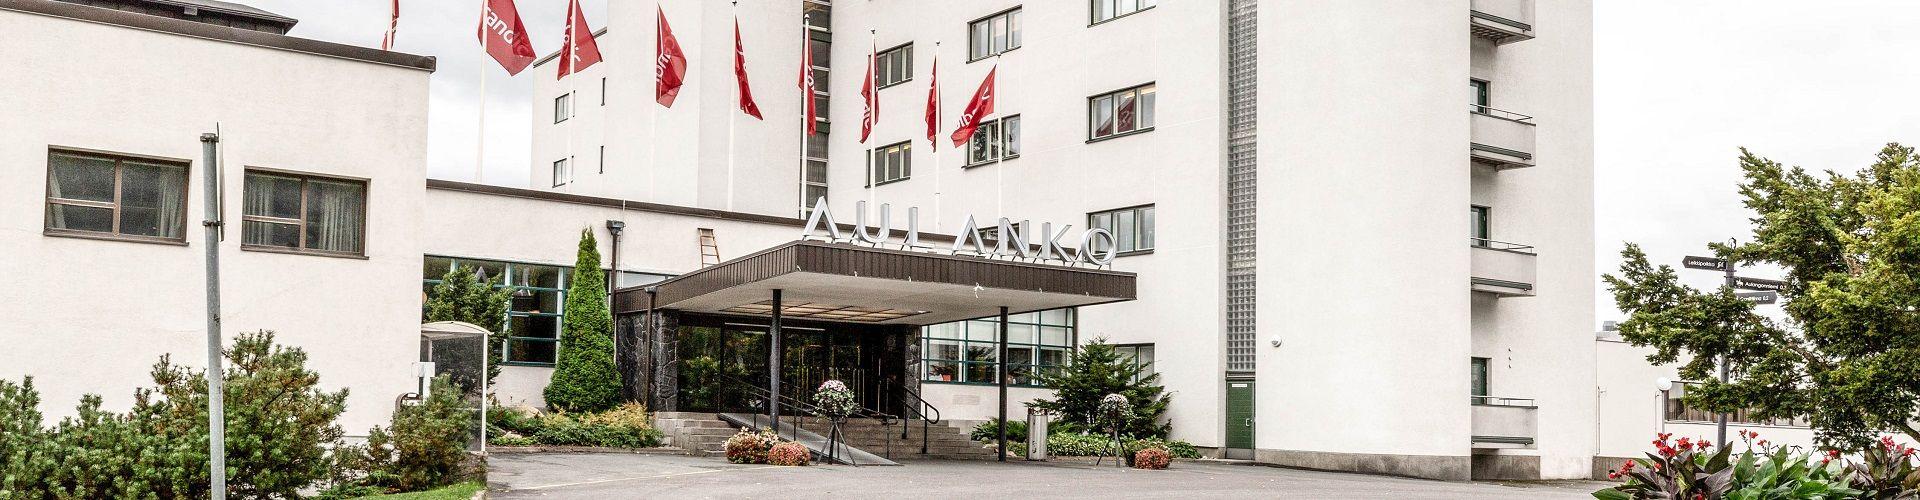 Hotelli & Green fee-paketit